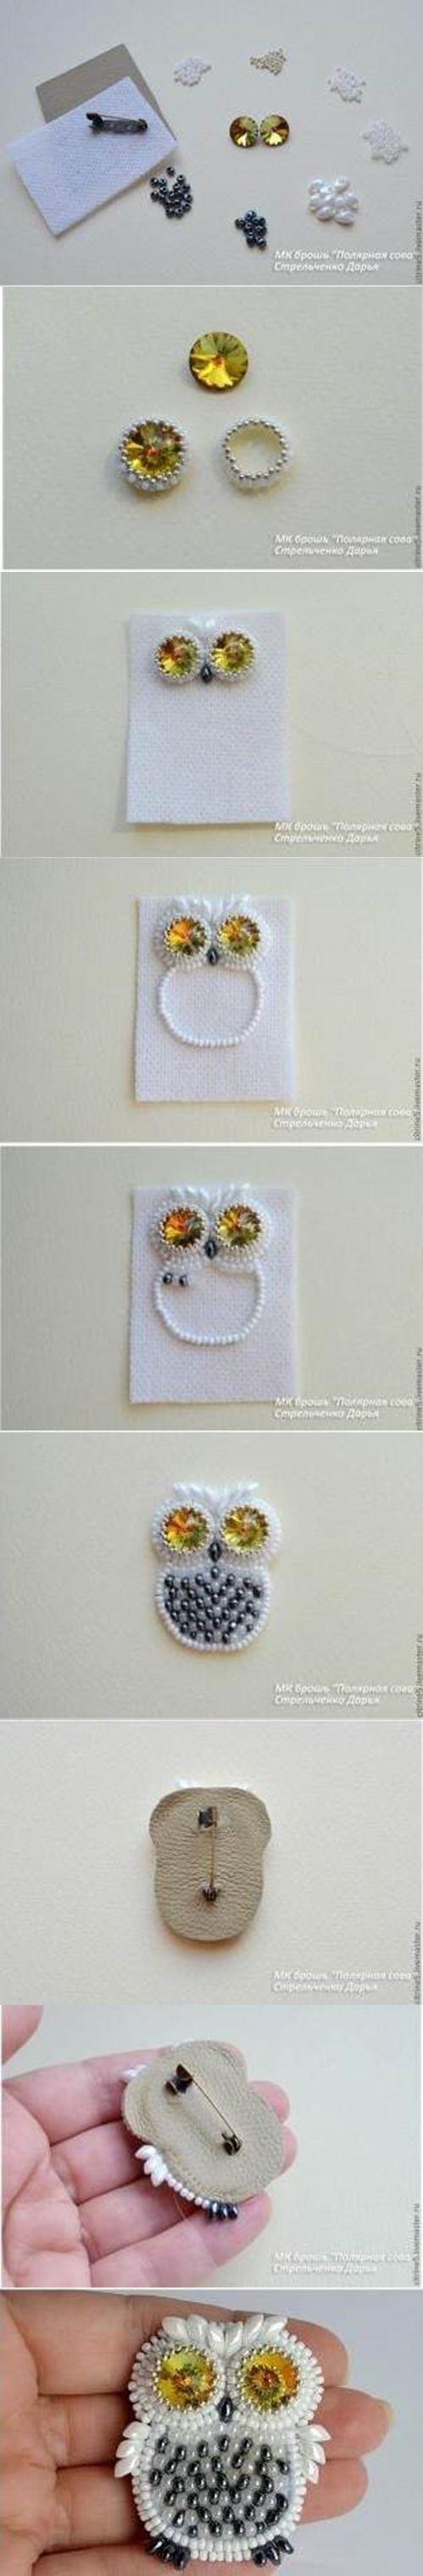 DIY Cute Beads Owl Pin   iCreativeIdeas.com LIKE Us on Facebook ==> https://www.facebook.com/icreativeideas